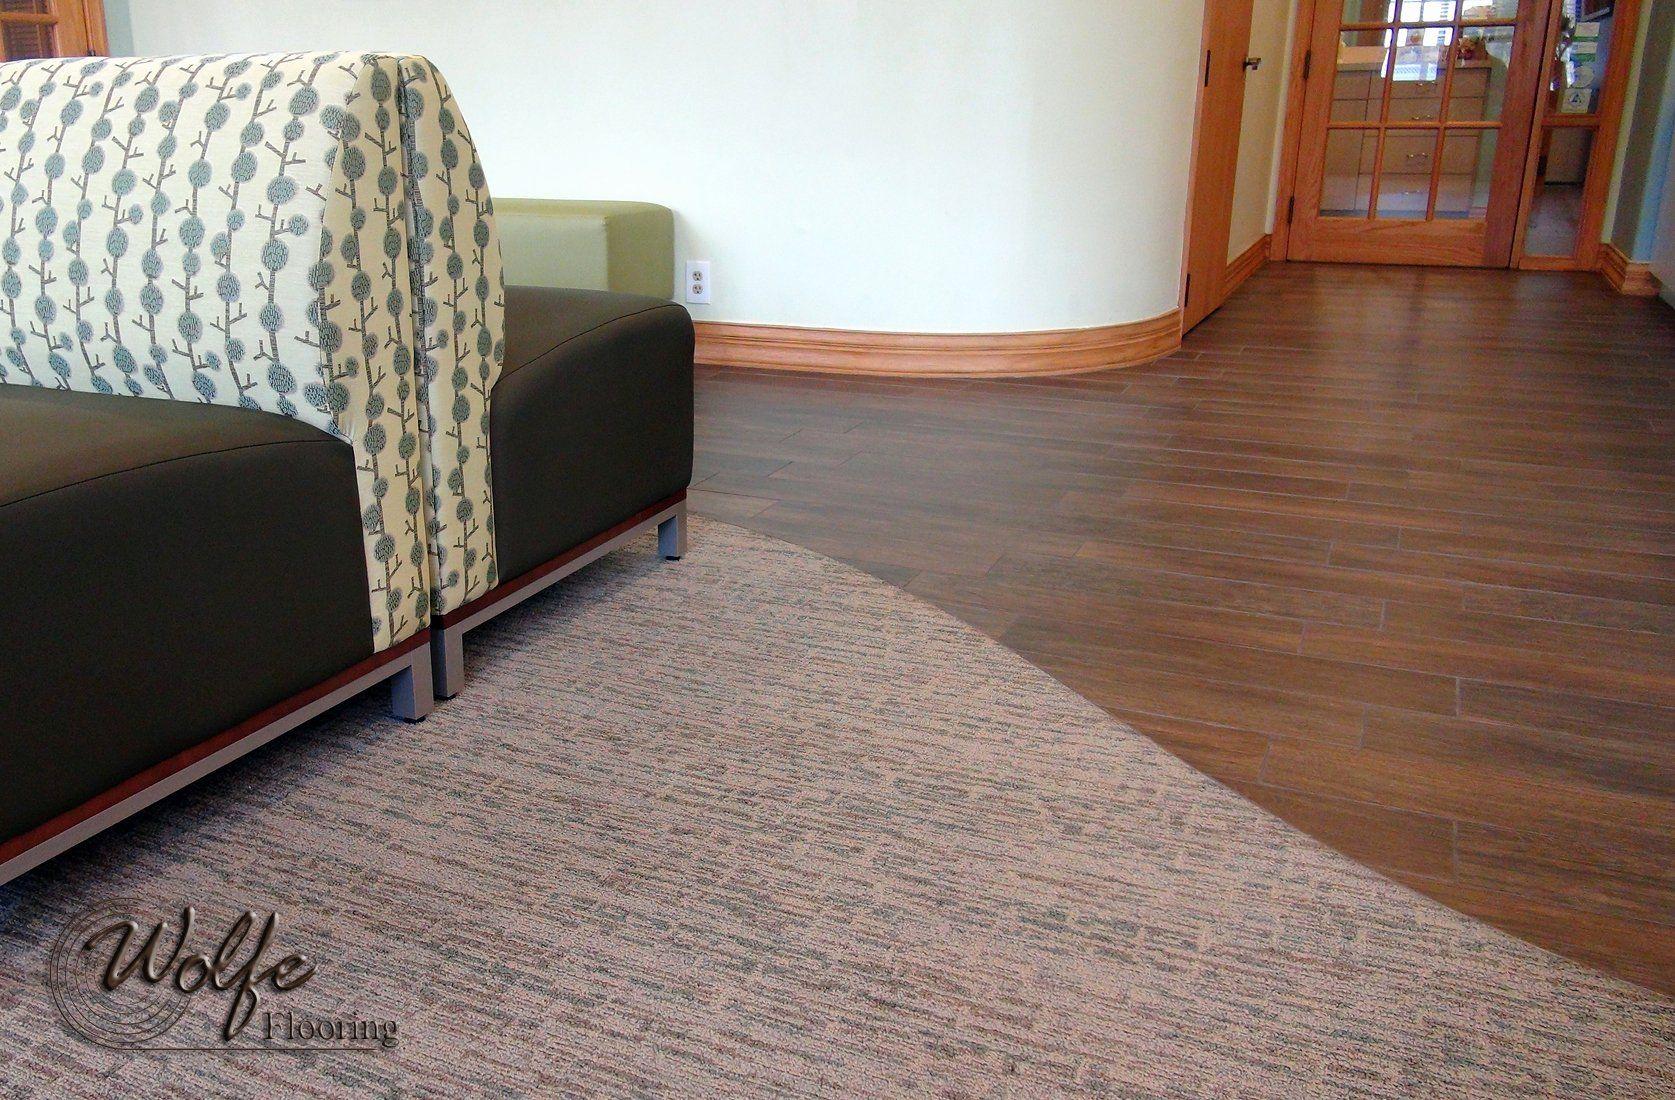 25 Laminate Flooring to Carpet Transition Luxury vinyl